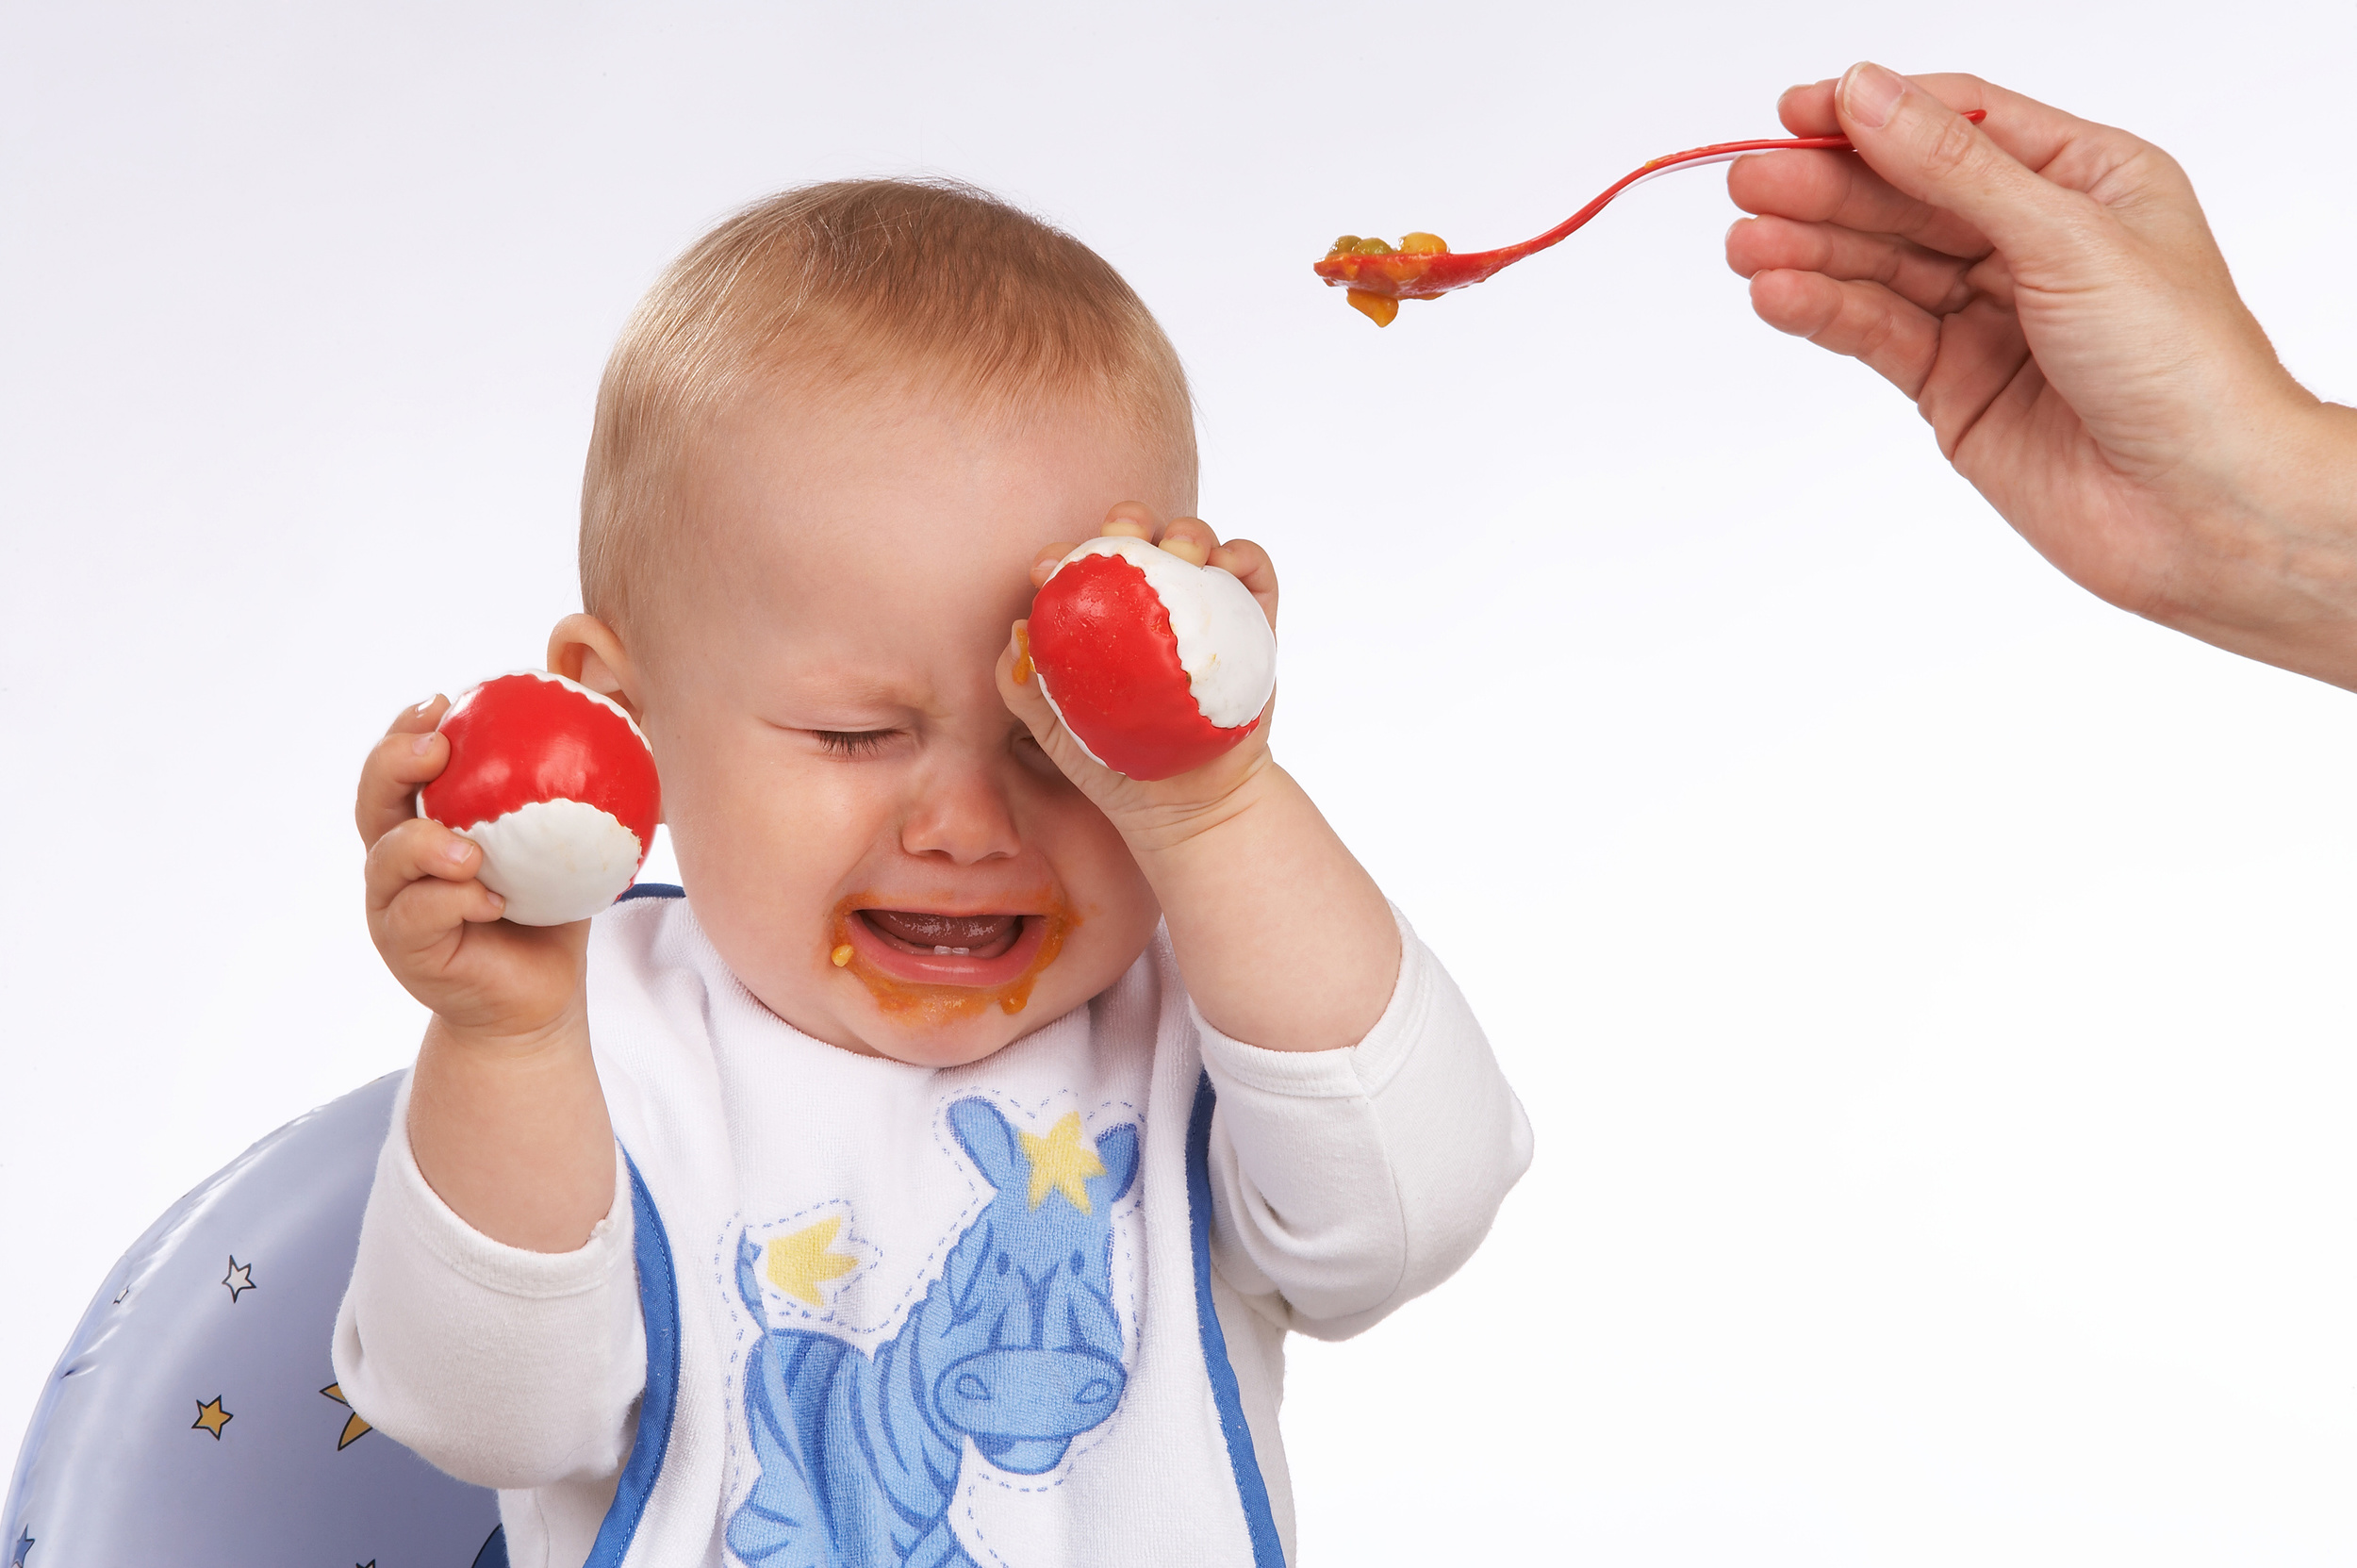 Why I Regret Feeding My Child Solids Too Soon...